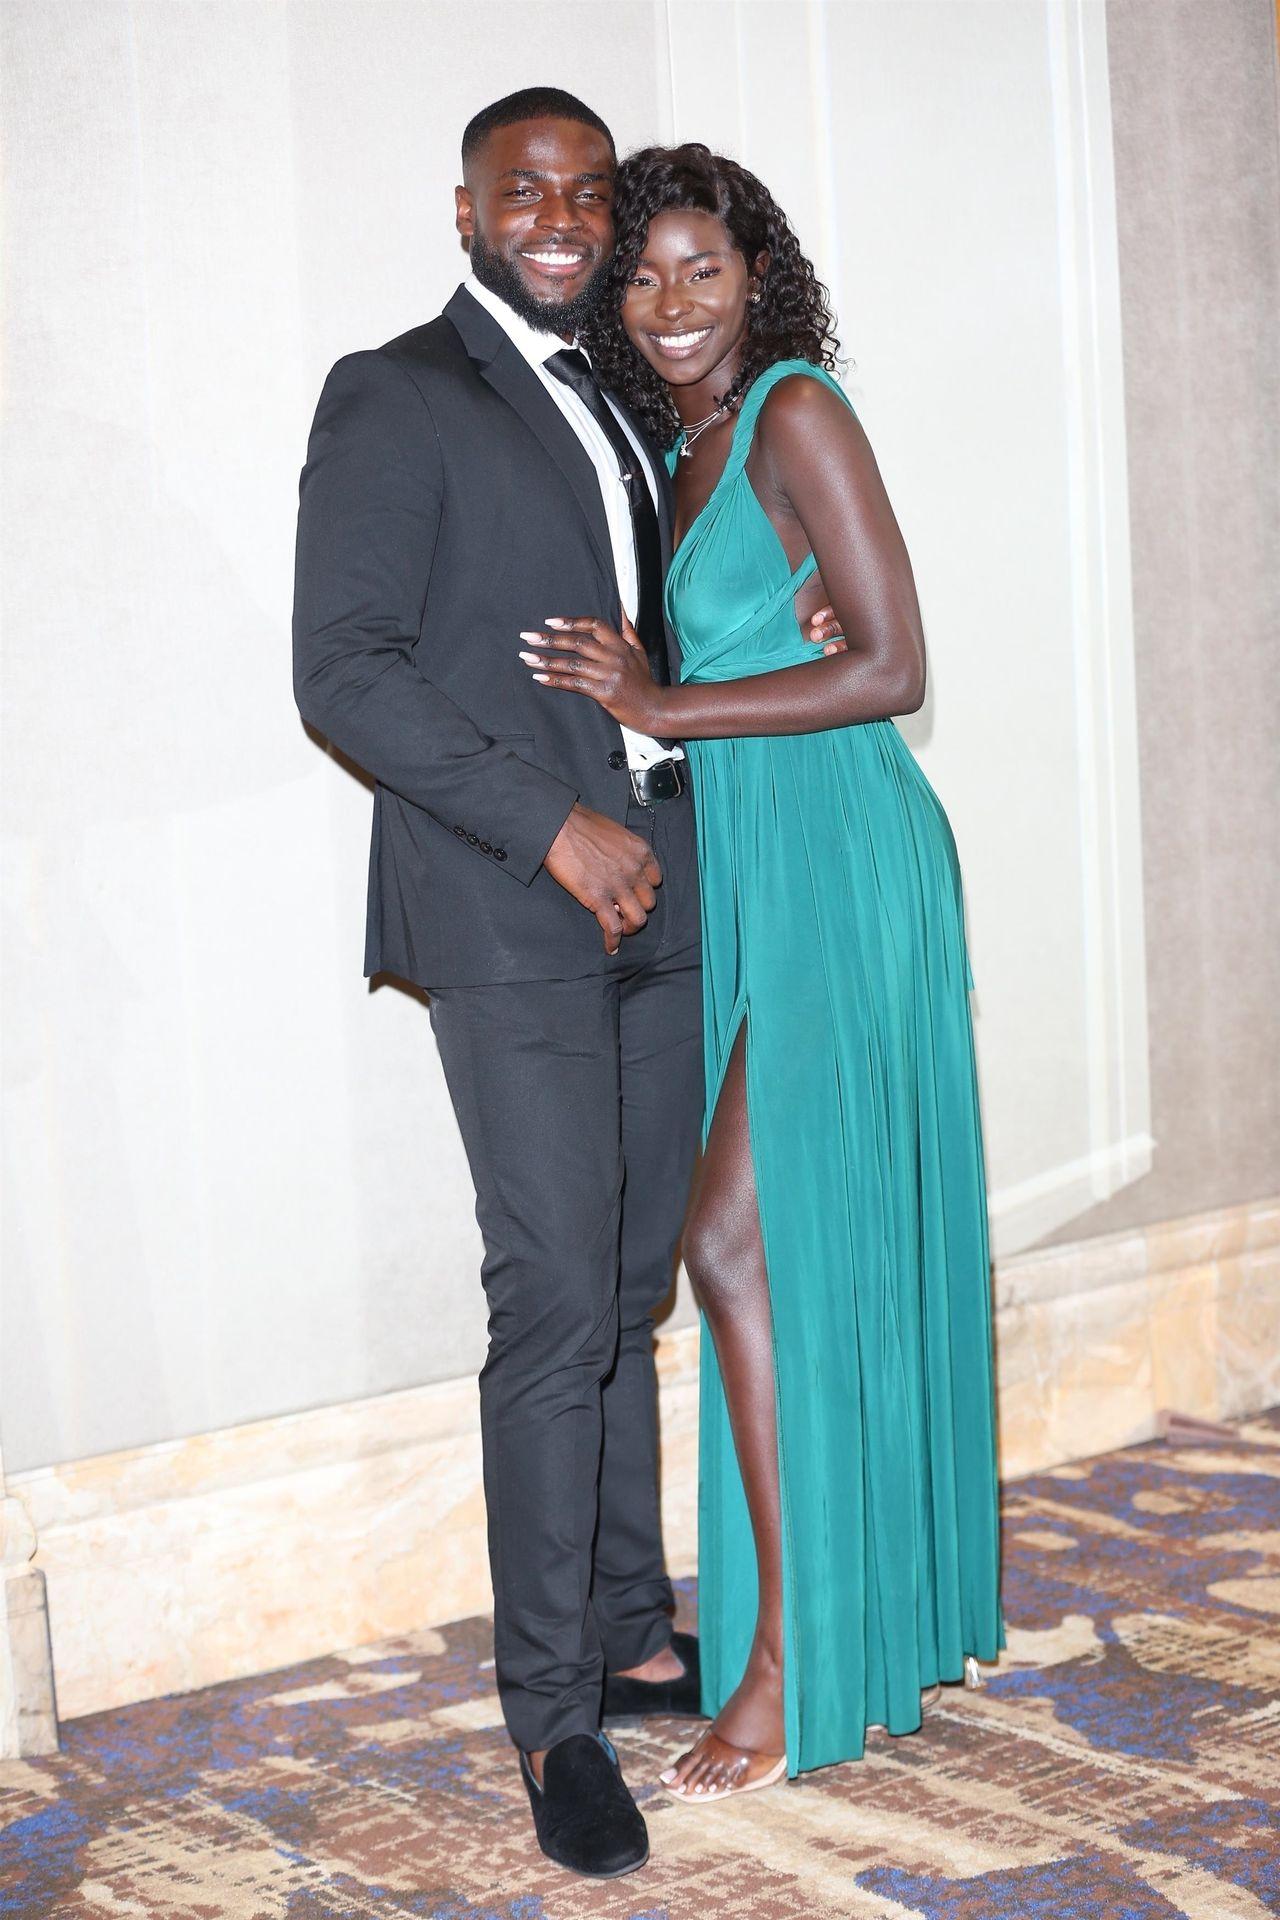 Mike Boateng & Priscilla Anyabu Are Seen At British Ethnic Diversity Sports Awards 0128